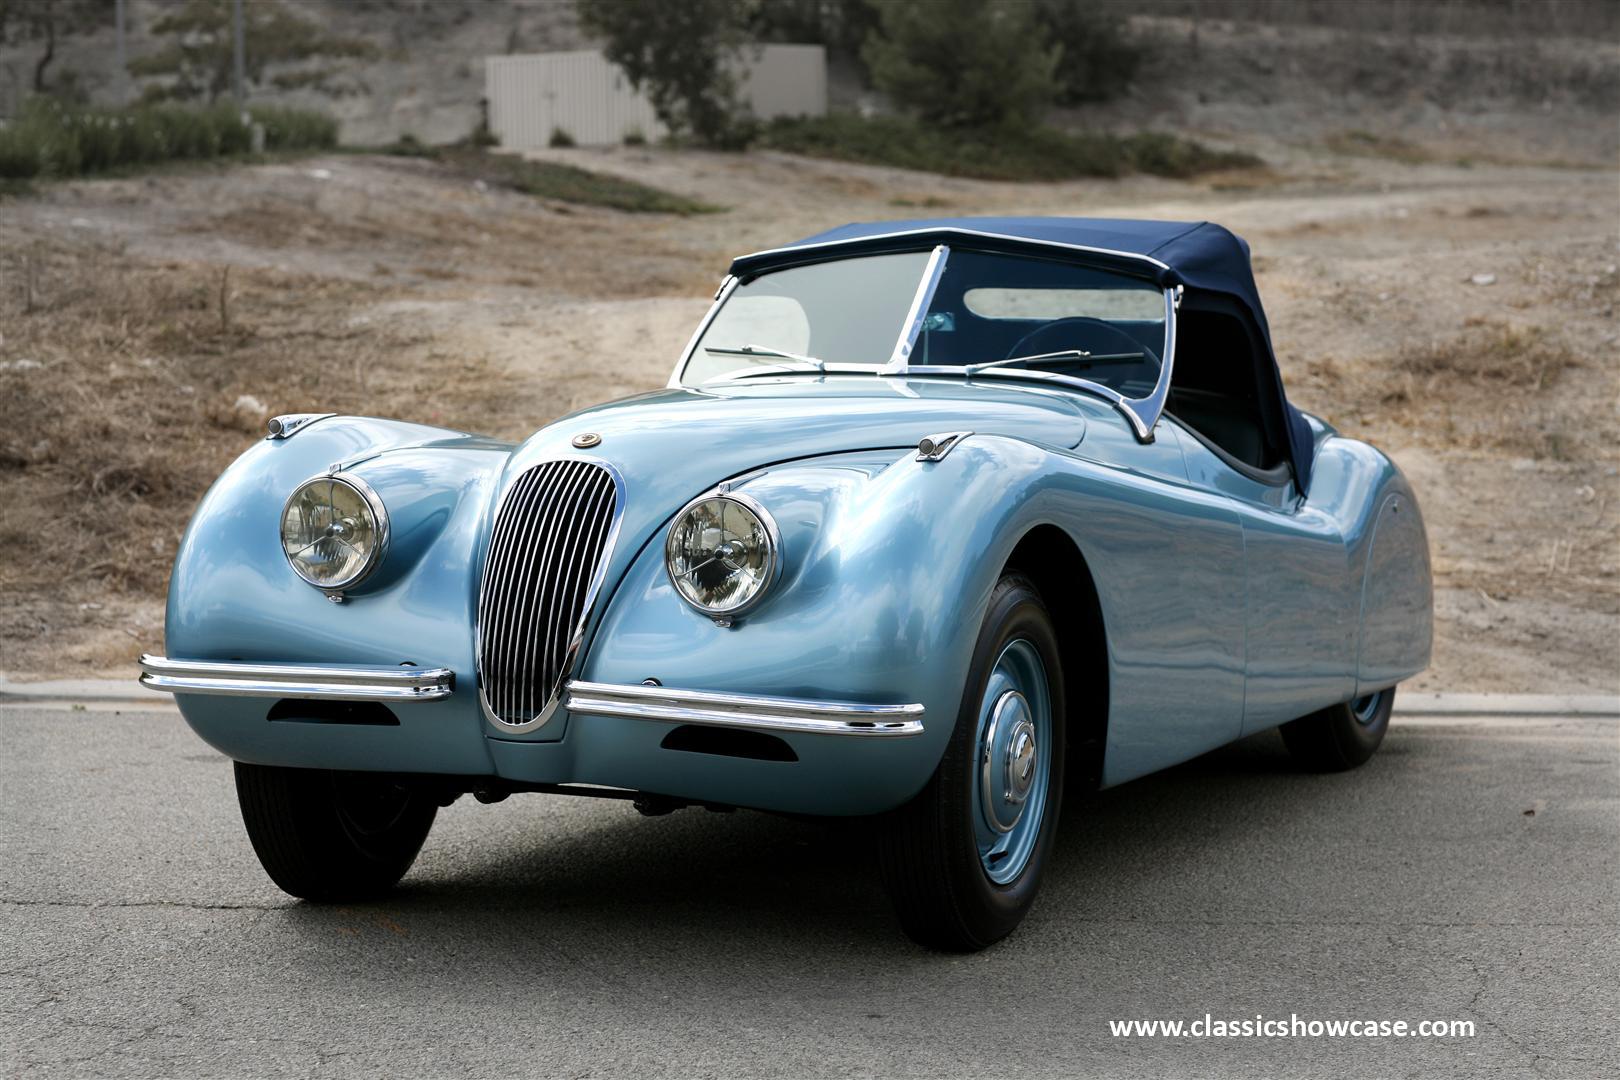 1950 jaguar xk 120 ots by classic showcase. Black Bedroom Furniture Sets. Home Design Ideas